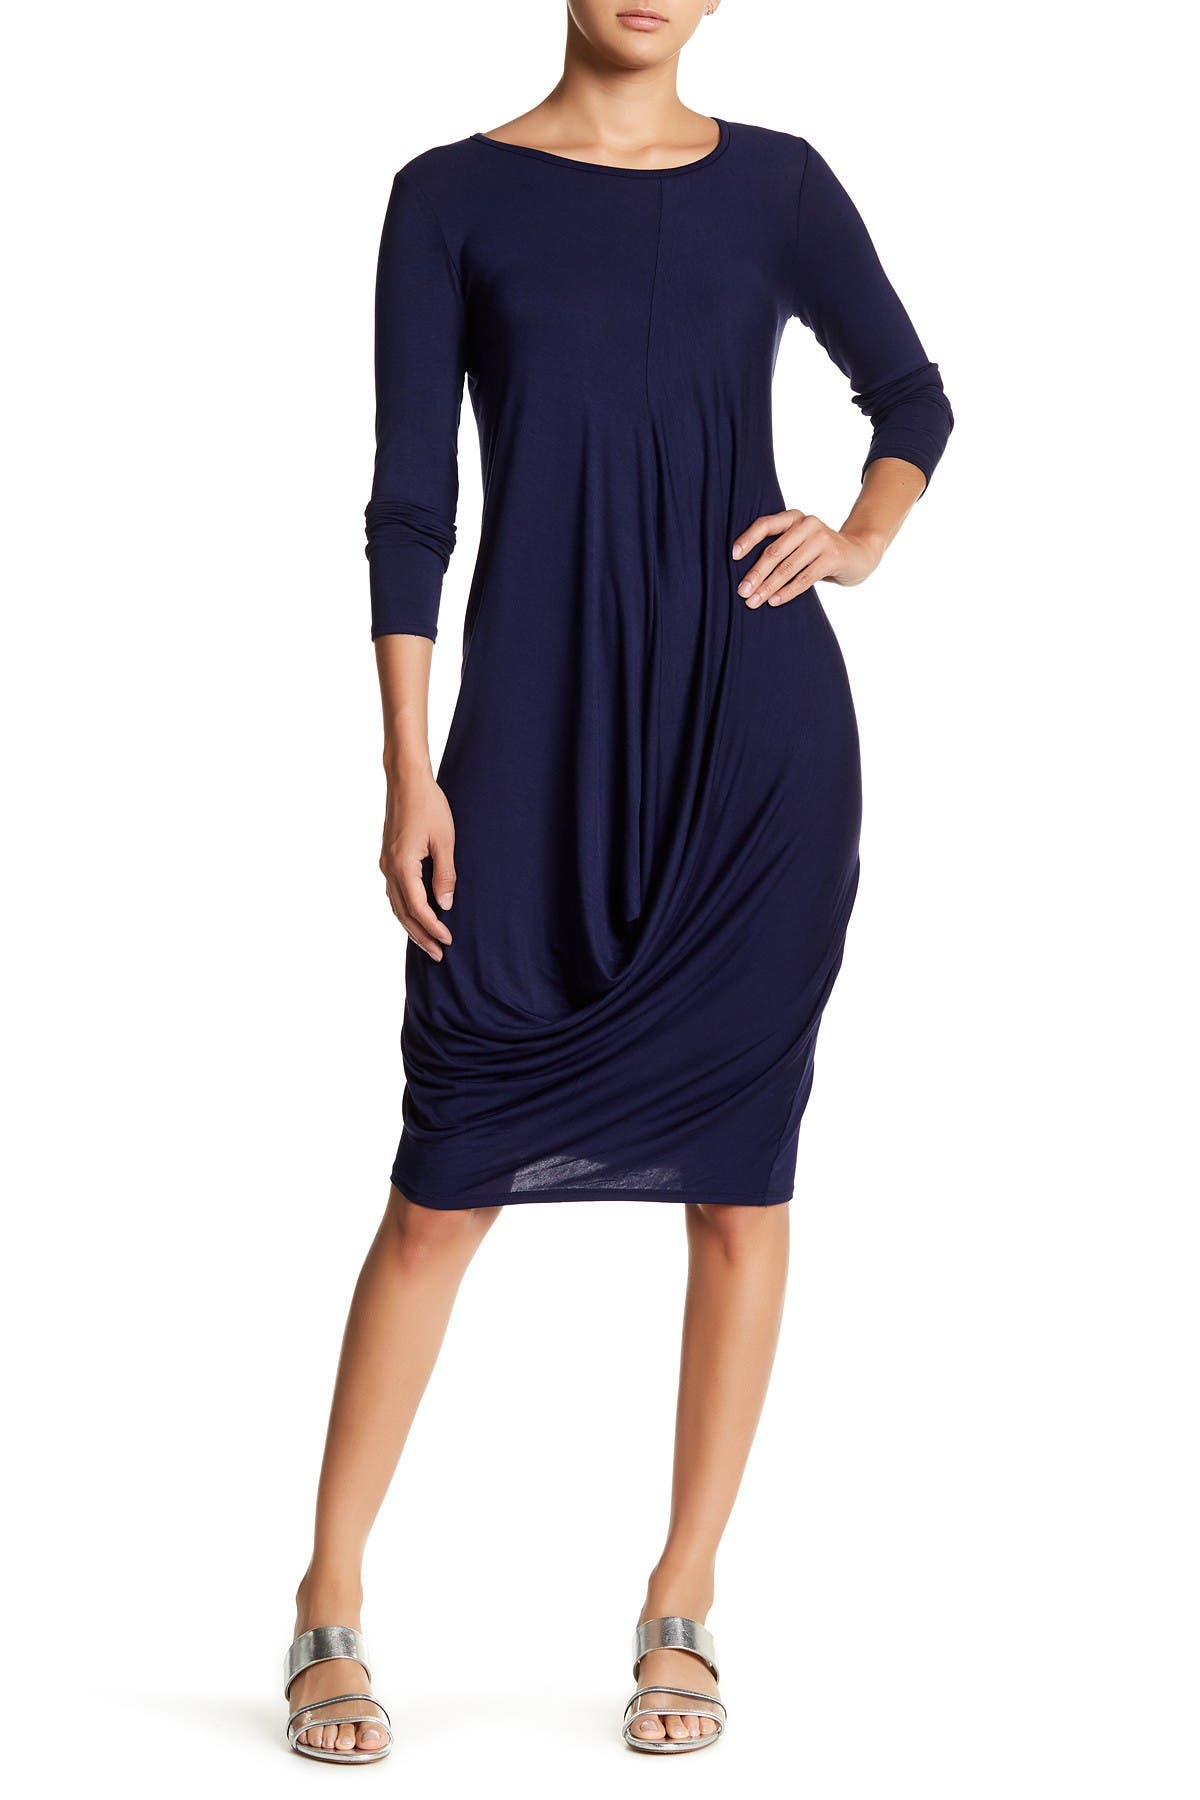 Image of Go Couture Drape Long Sleeve Dress